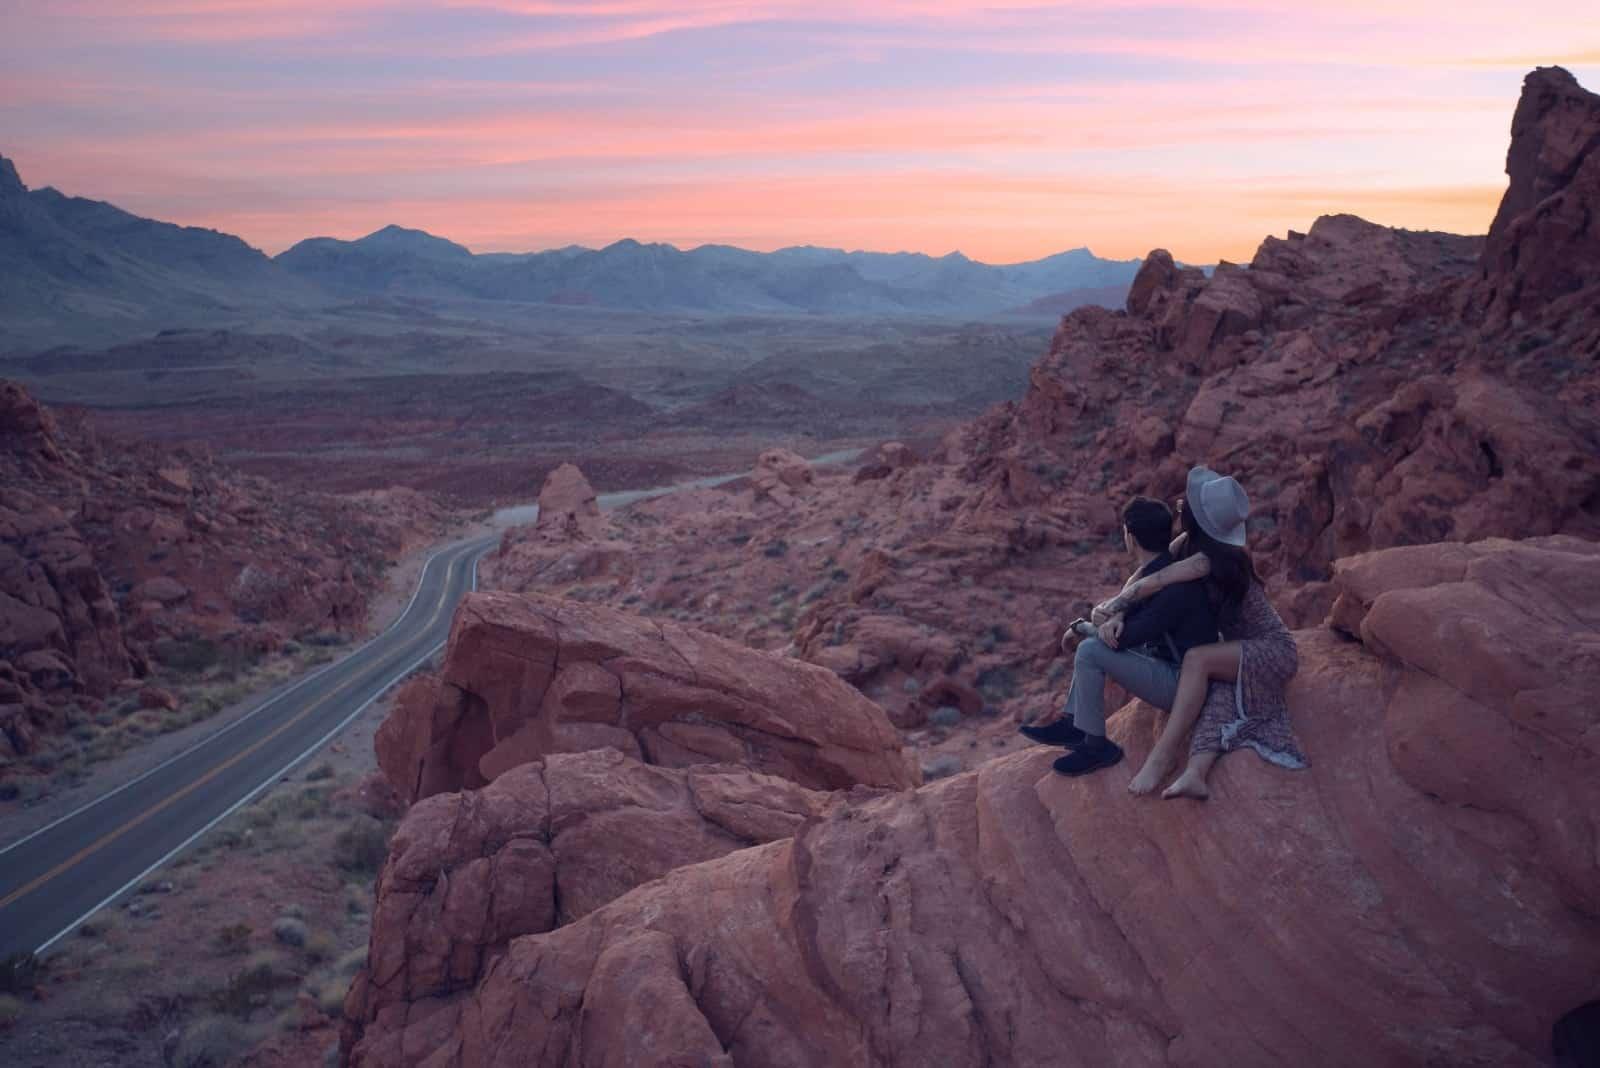 woman hugging man while sitting on rock